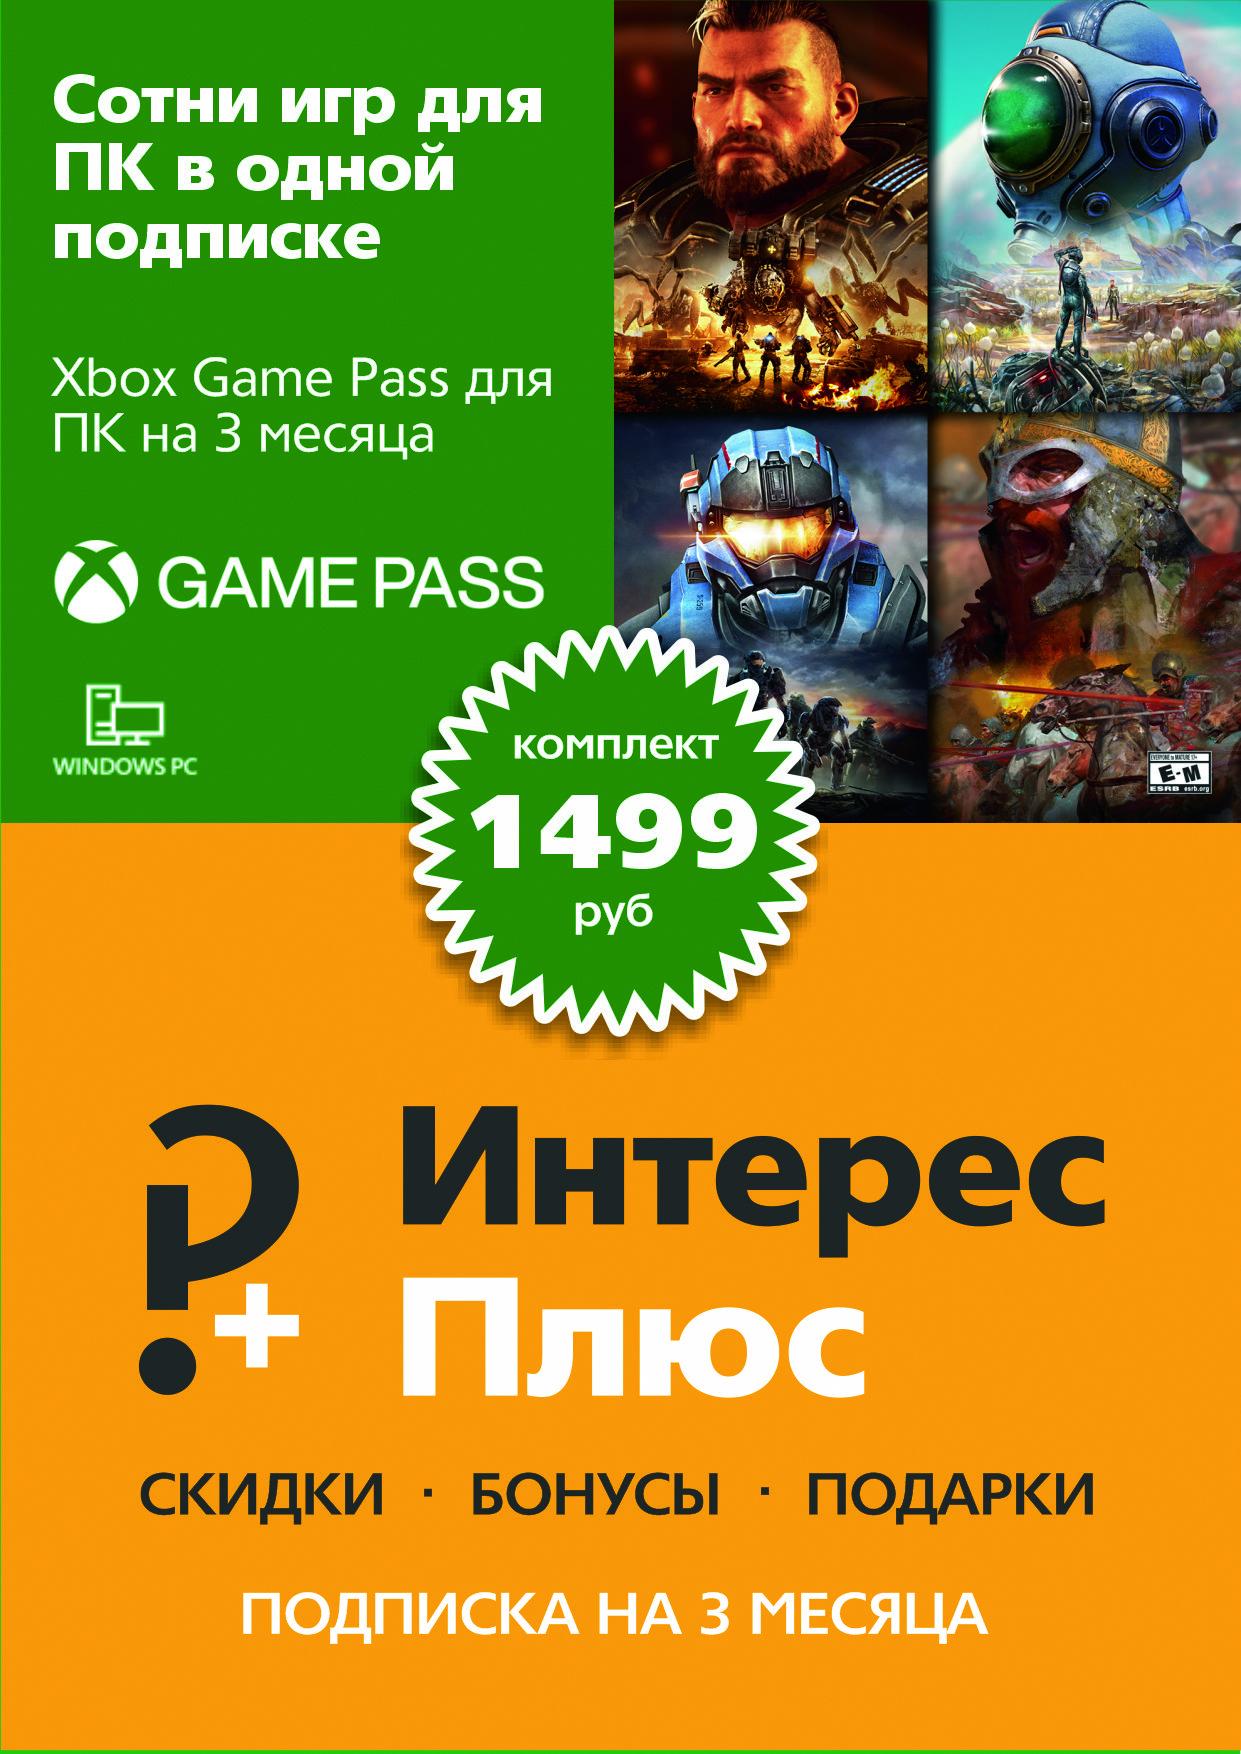 Подписка Интерес Плюс + Xbox Game Pass для ПК (3 месяца) [Цифровая версия] (Цифровая версия)